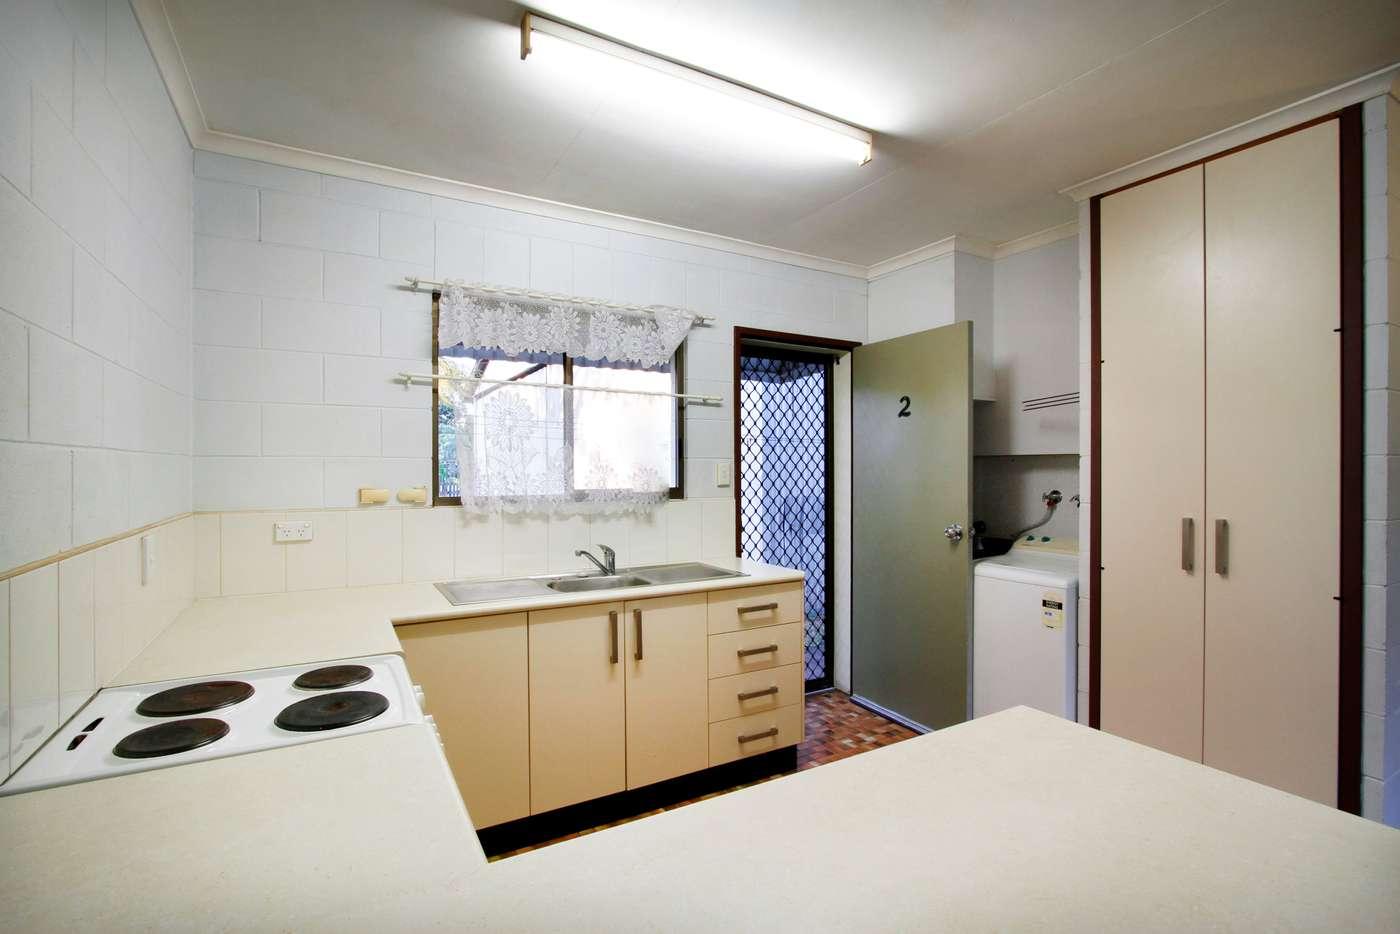 Main view of Homely unit listing, 2/5 Marathon Street, Proserpine QLD 4800